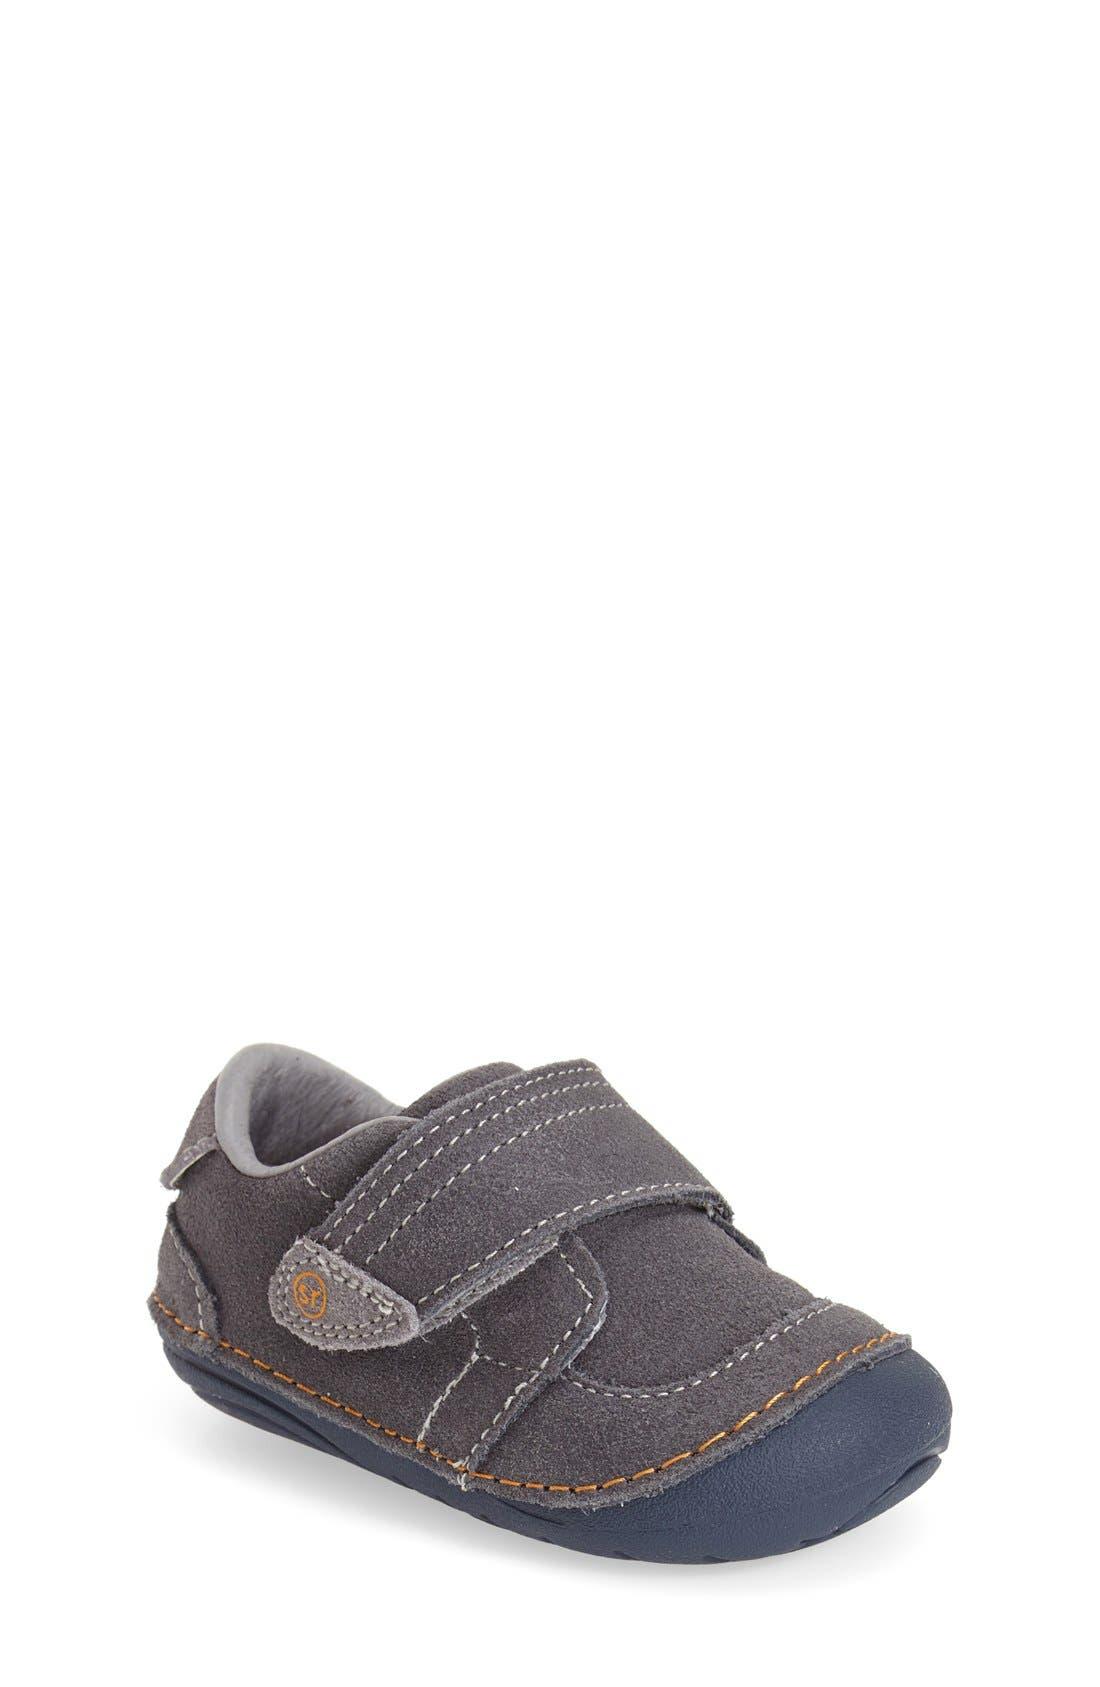 Soft Motion Kellen Sneaker,                             Main thumbnail 1, color,                             GREY